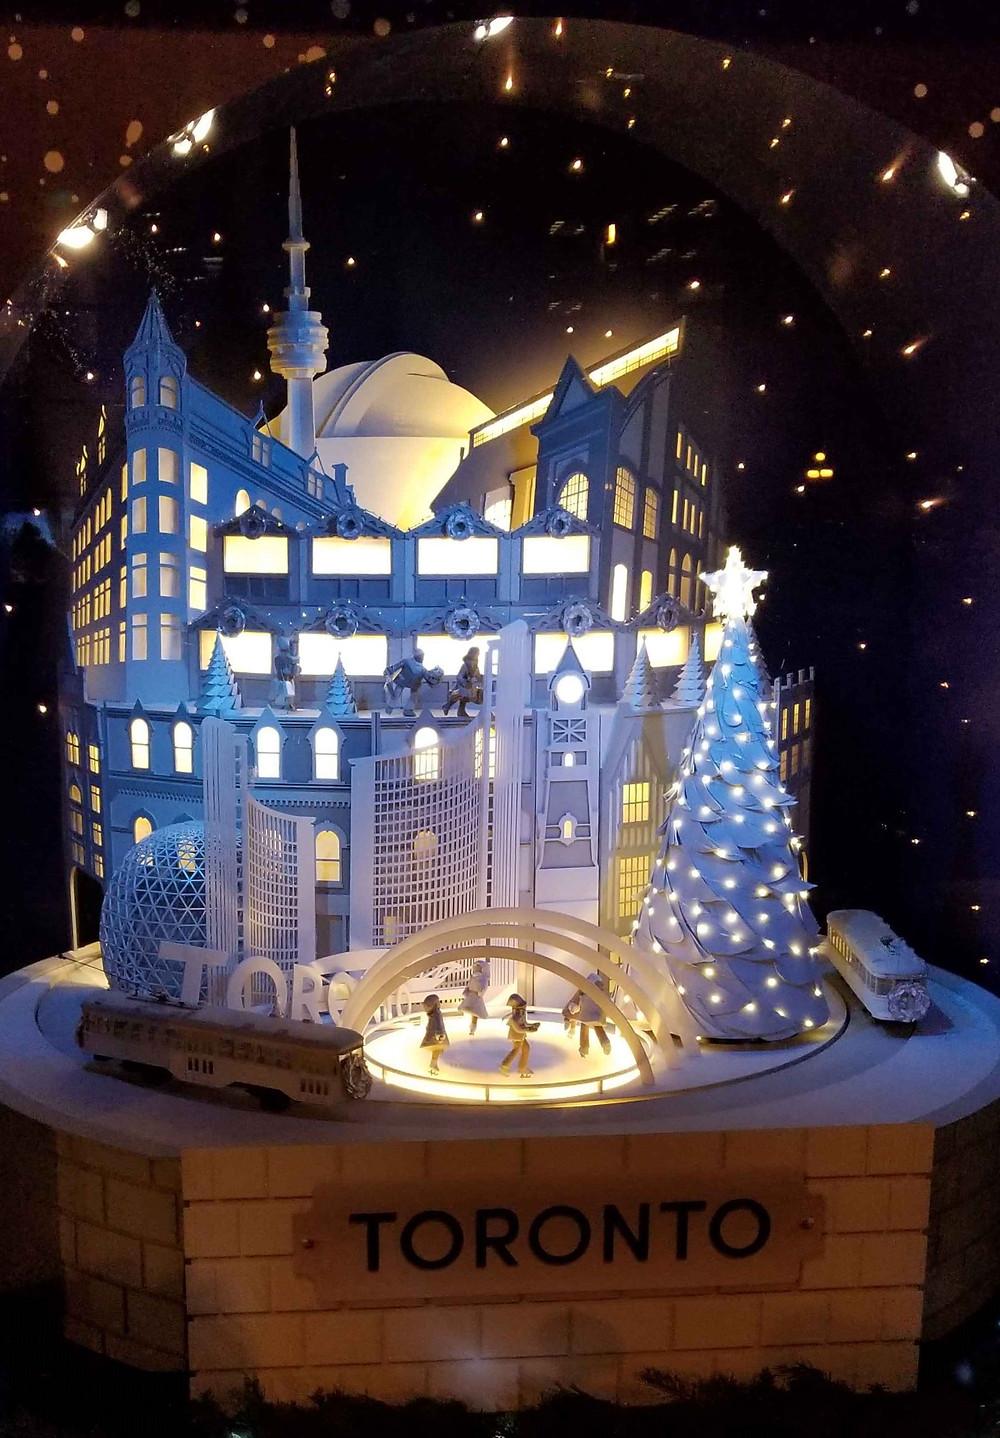 Toronto City Hall Snow Globe by Daniel See